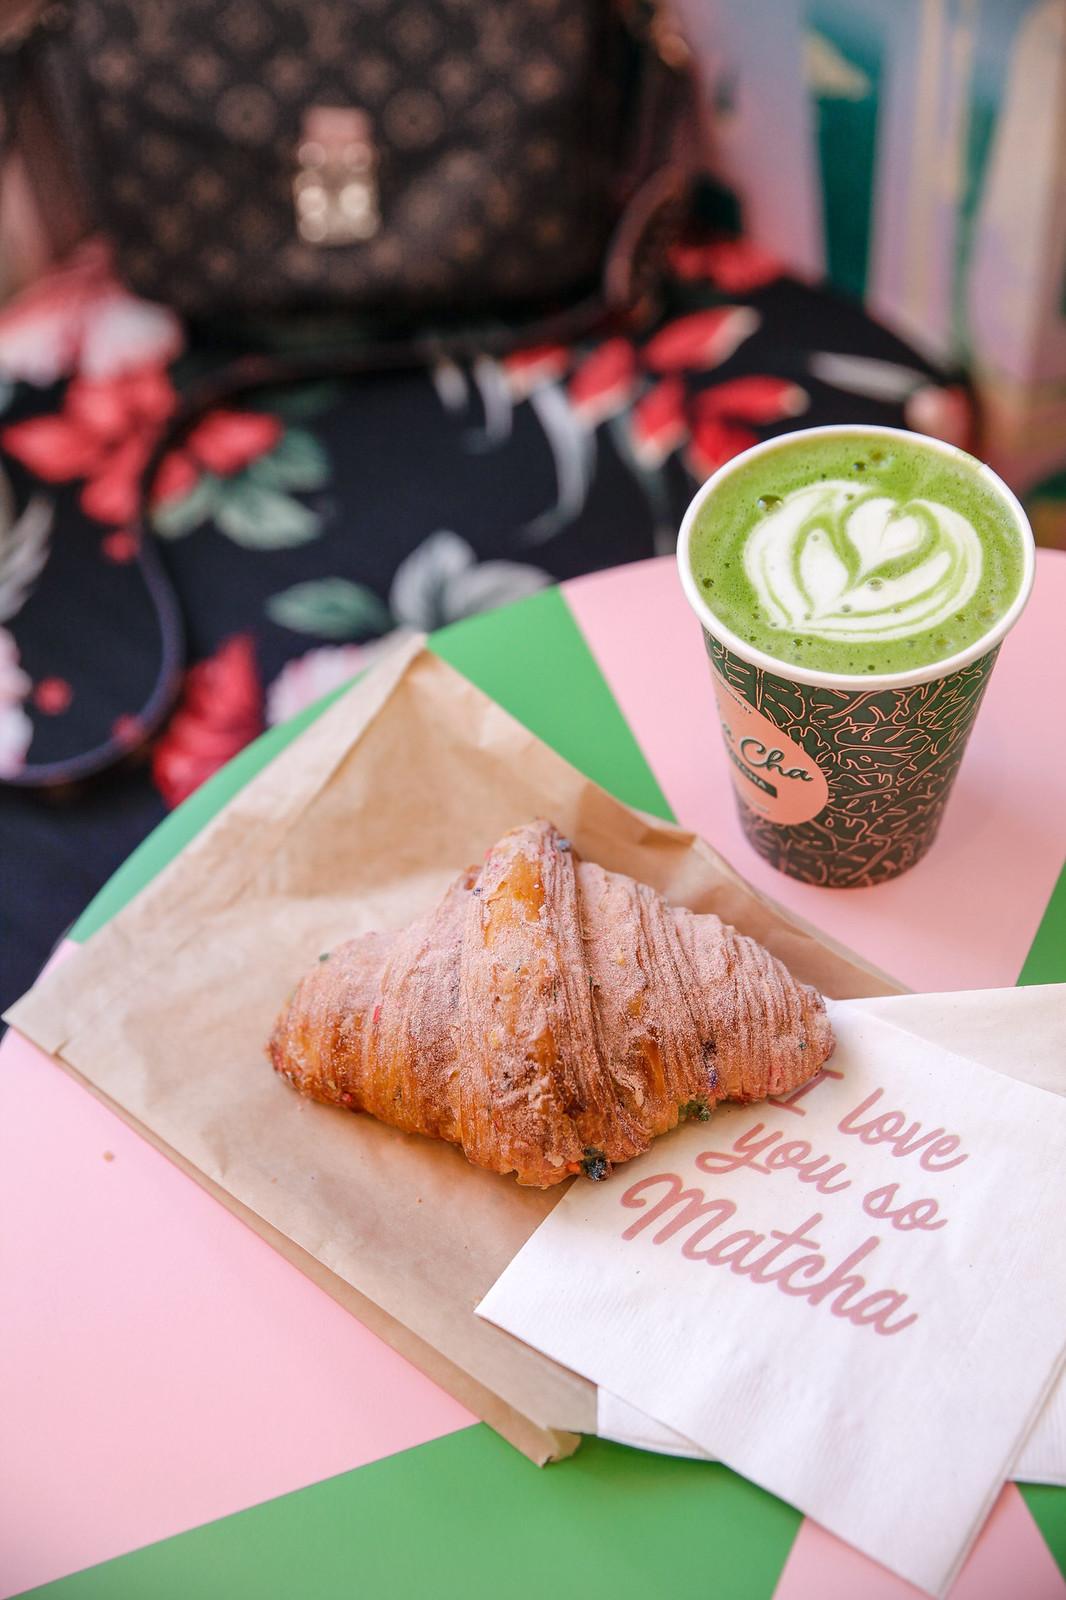 07_cha_cha_matcha_cafeteria_rosa_nueva_york_el_mejor_matcha_unicorn_croissant_breakfast_theguestgirl_nyc